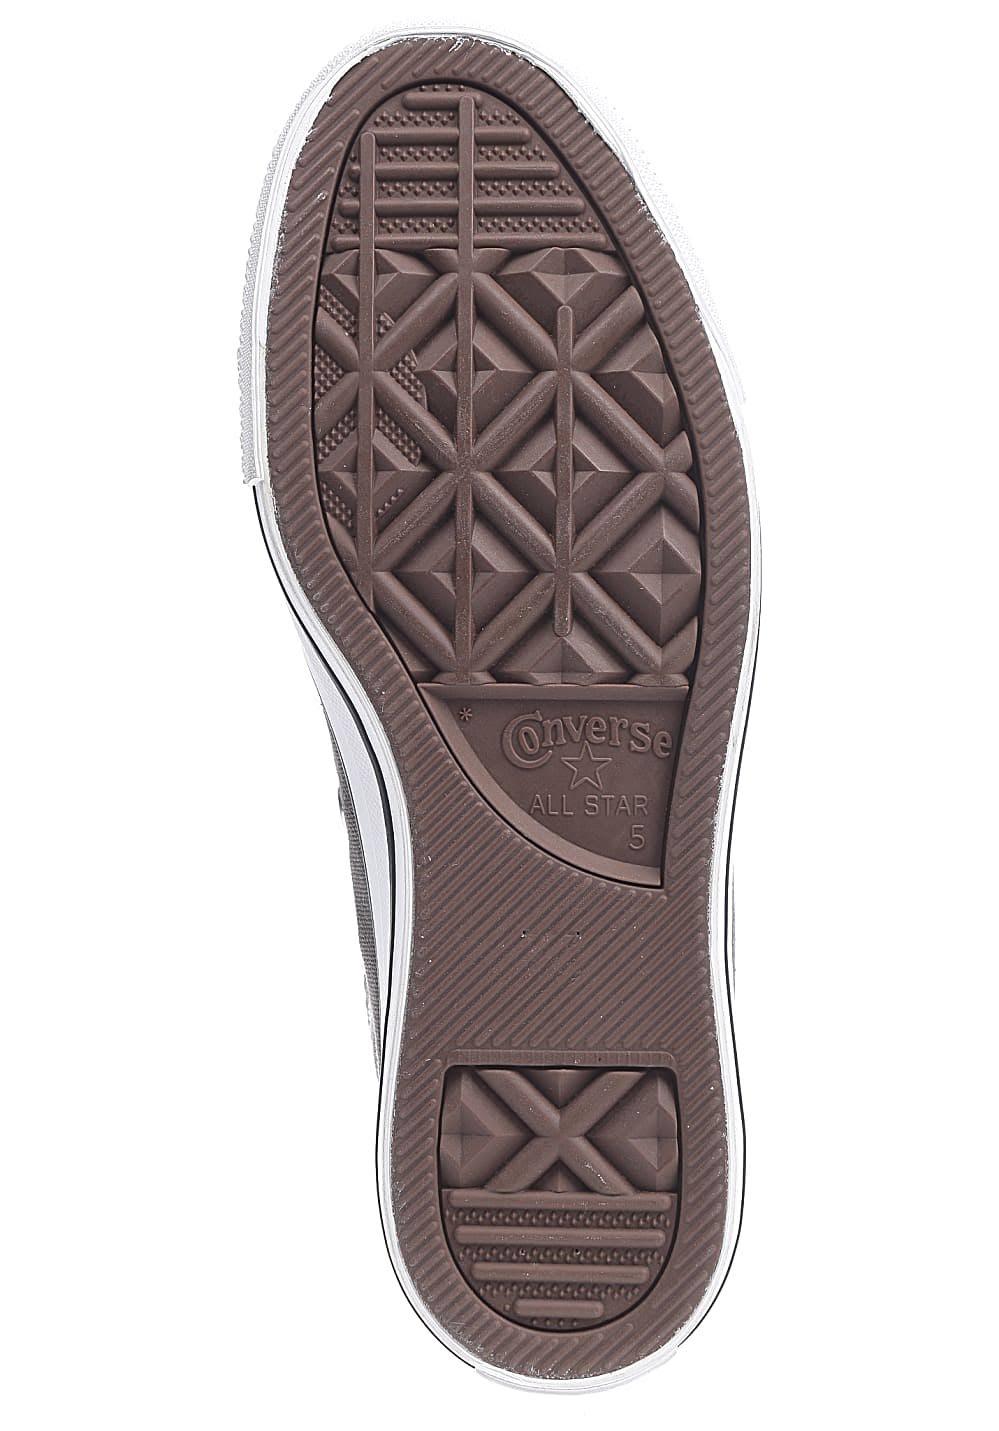 High Sneakers Grau Unisex All Converse Hoch Charcoal Star 35 Größe Hi 1j793 wx0AqUAzY